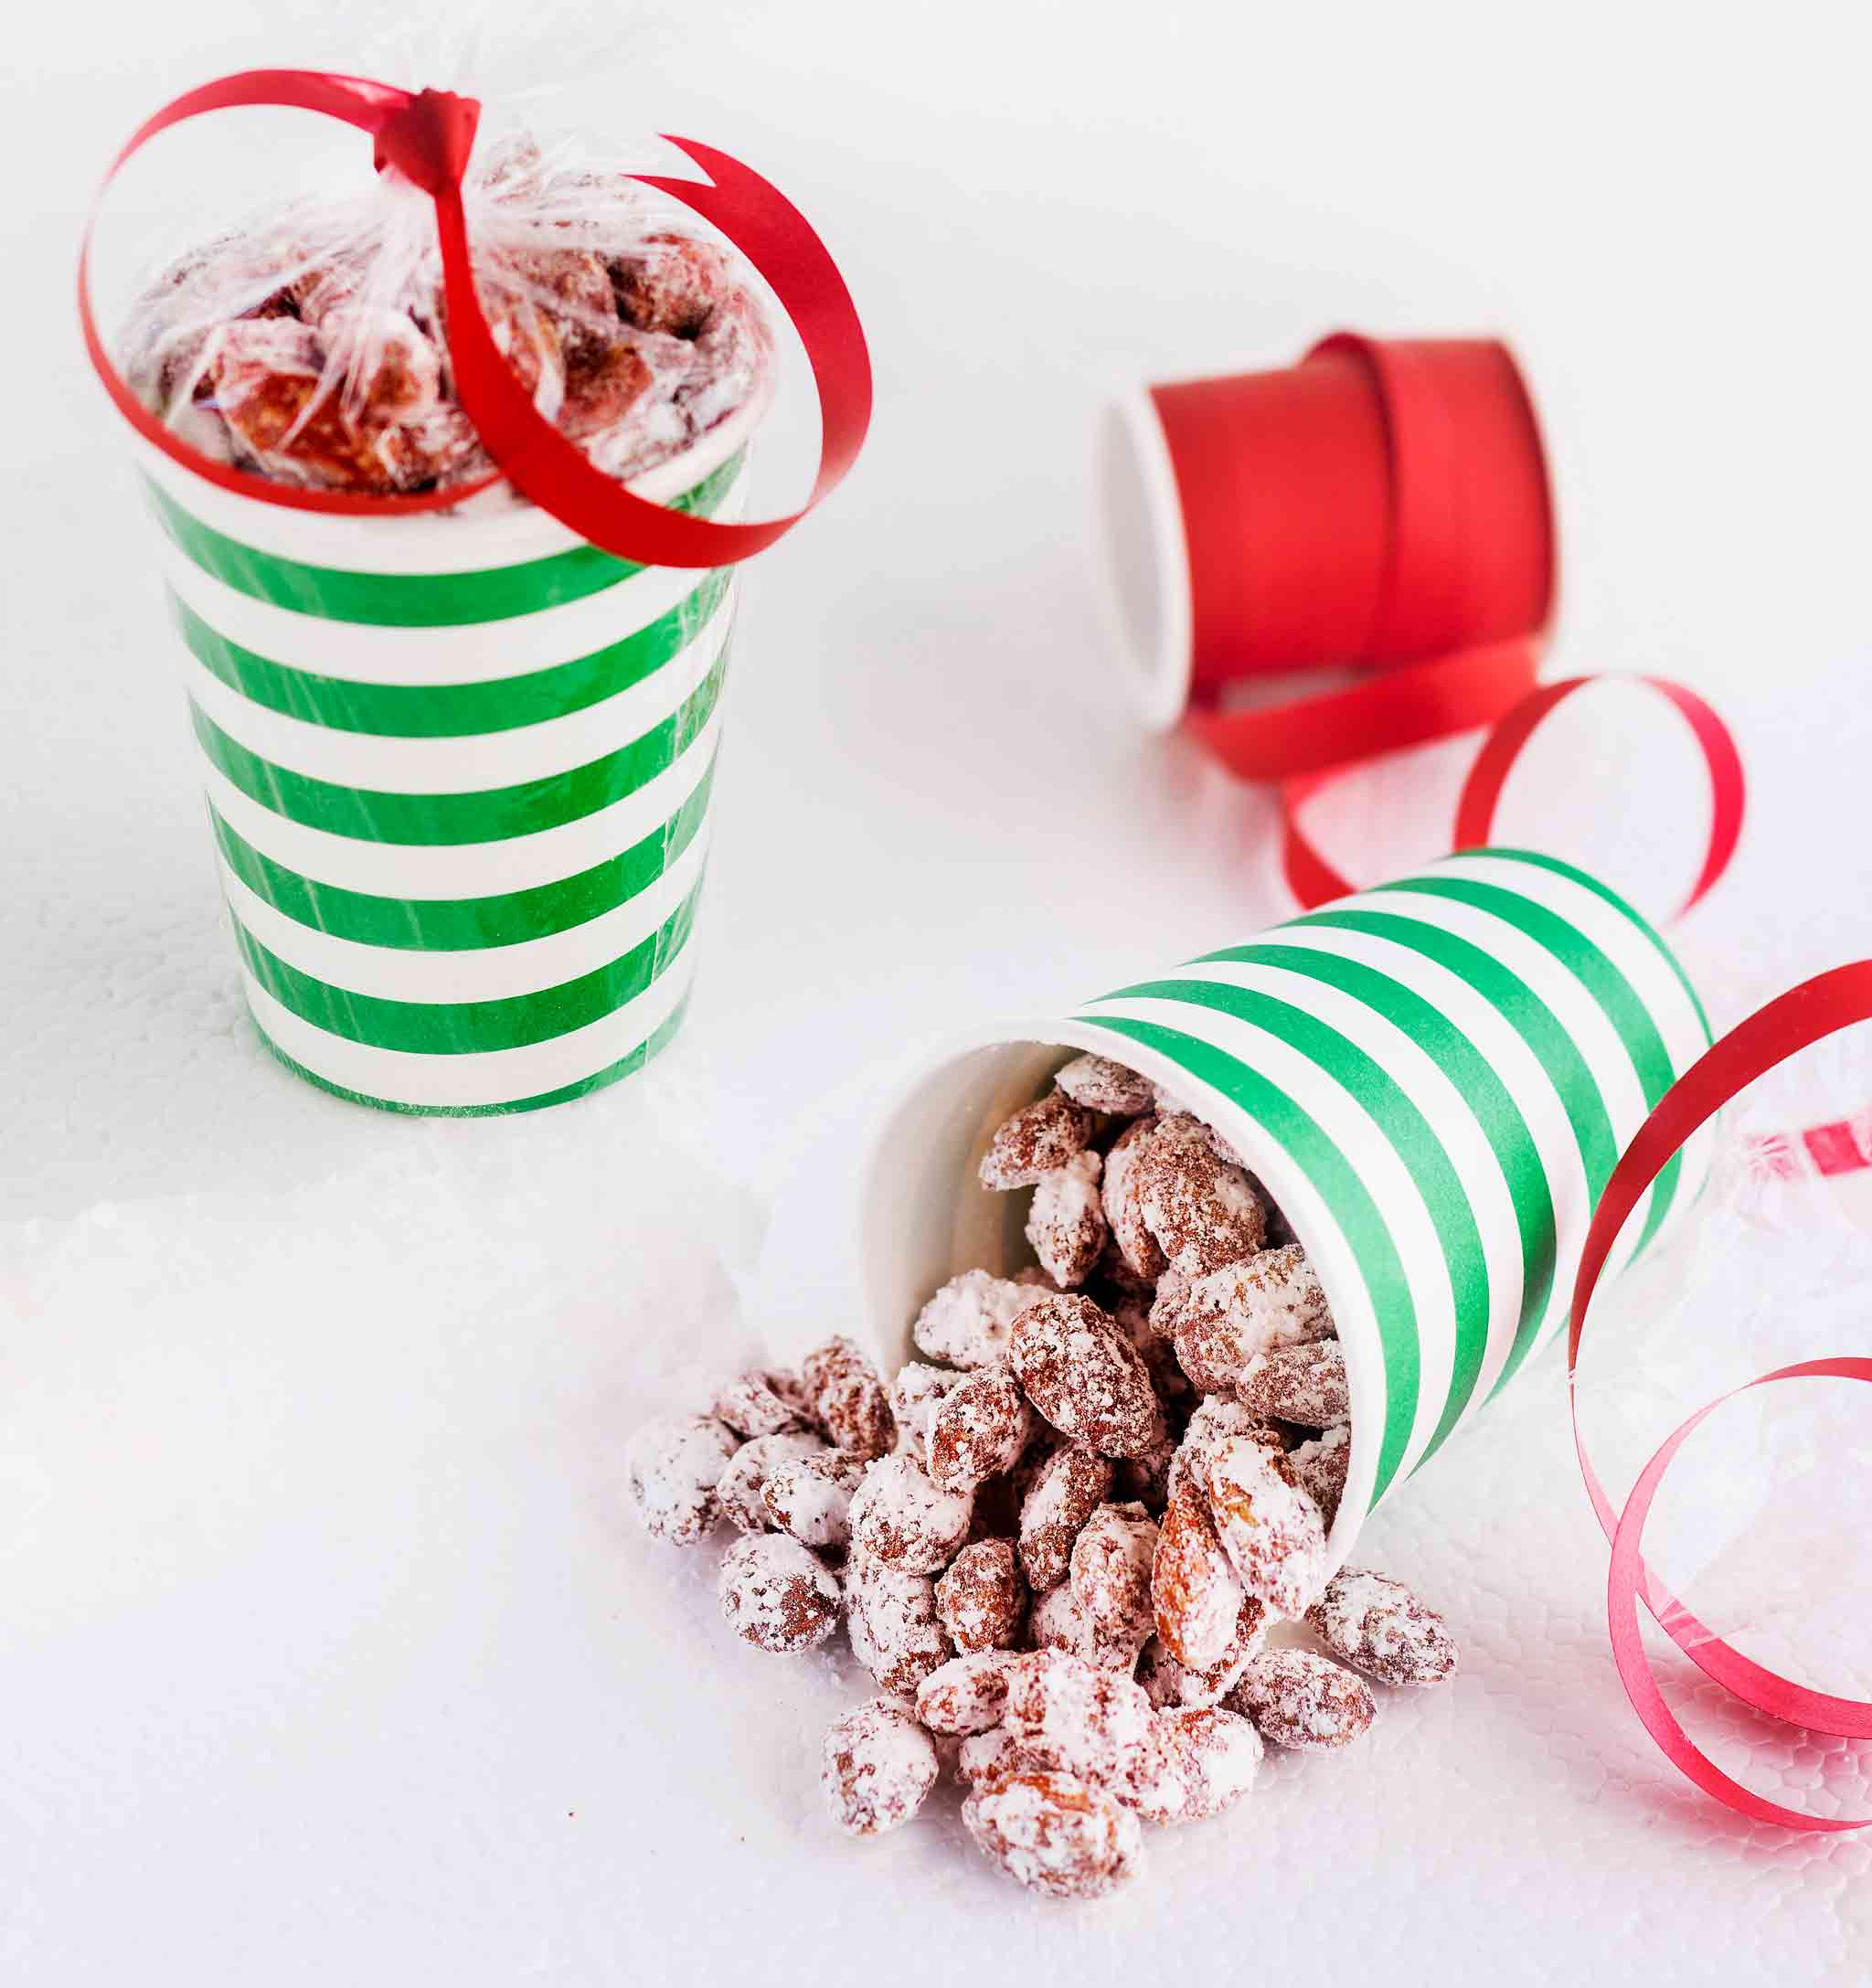 Kaneli-sokerimantelit